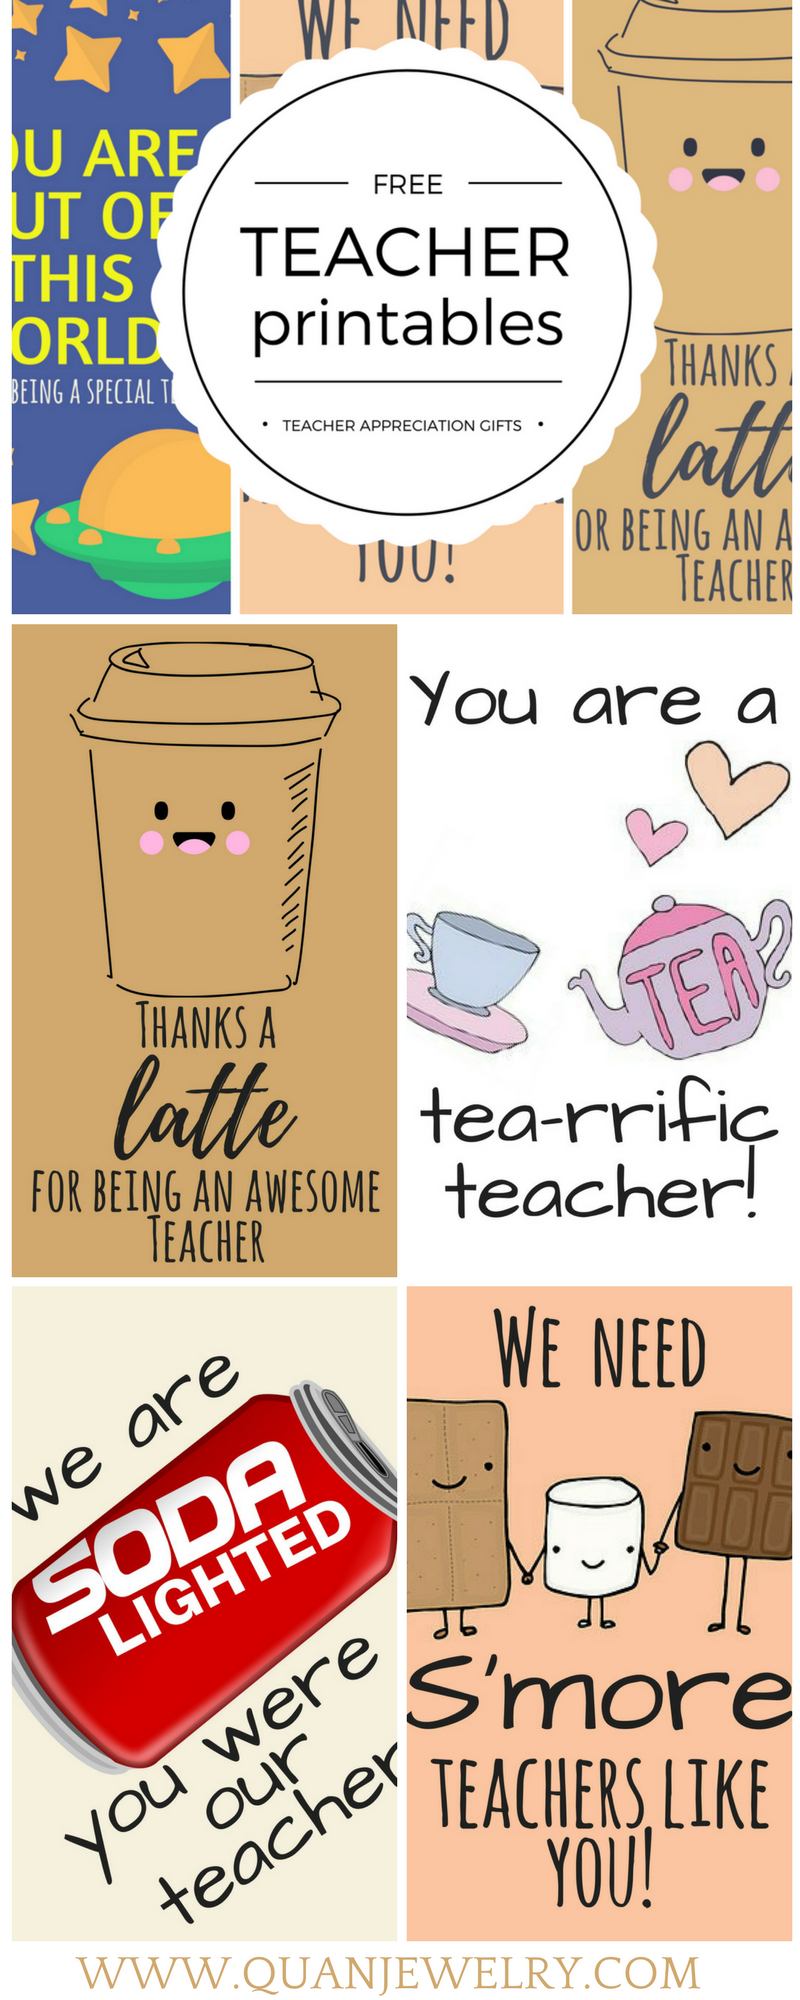 Free Printable Teacher Appreciation Thank You Cards   Teacher Gift - Free Teacher Appreciation Week Printable Cards